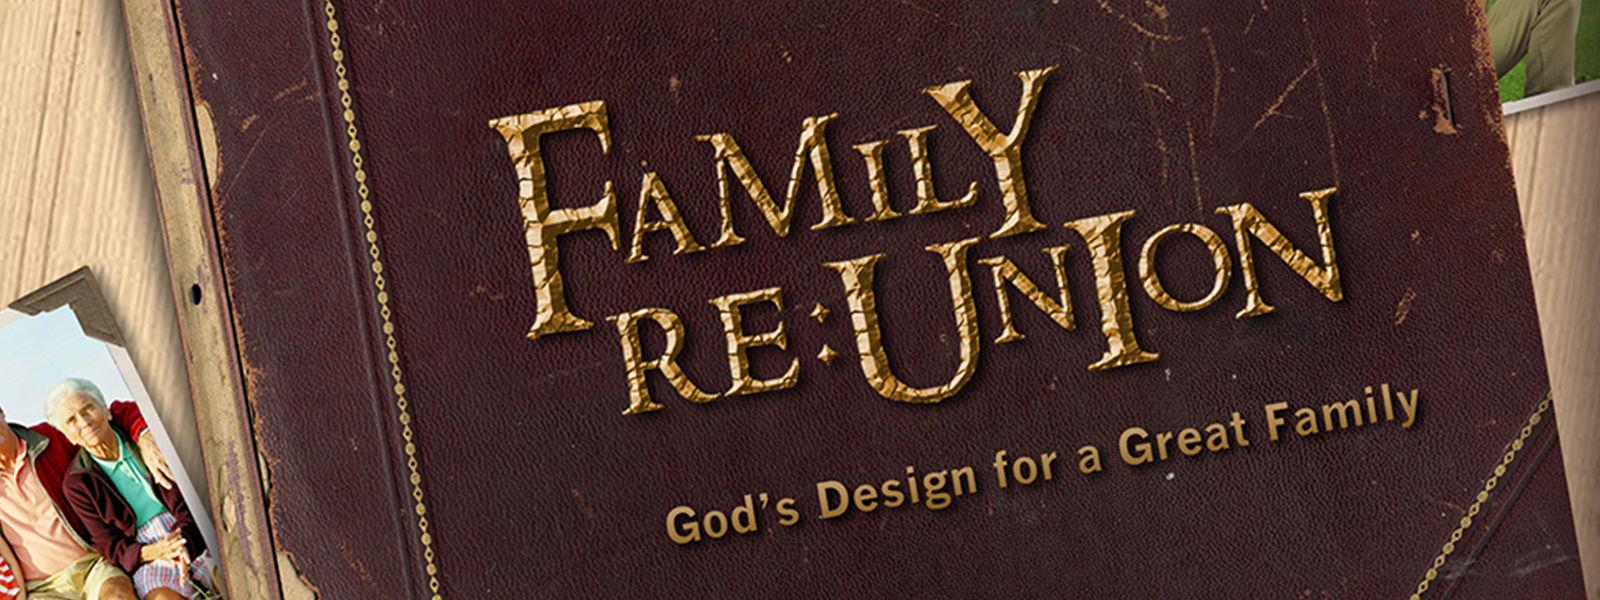 Family Re:Union